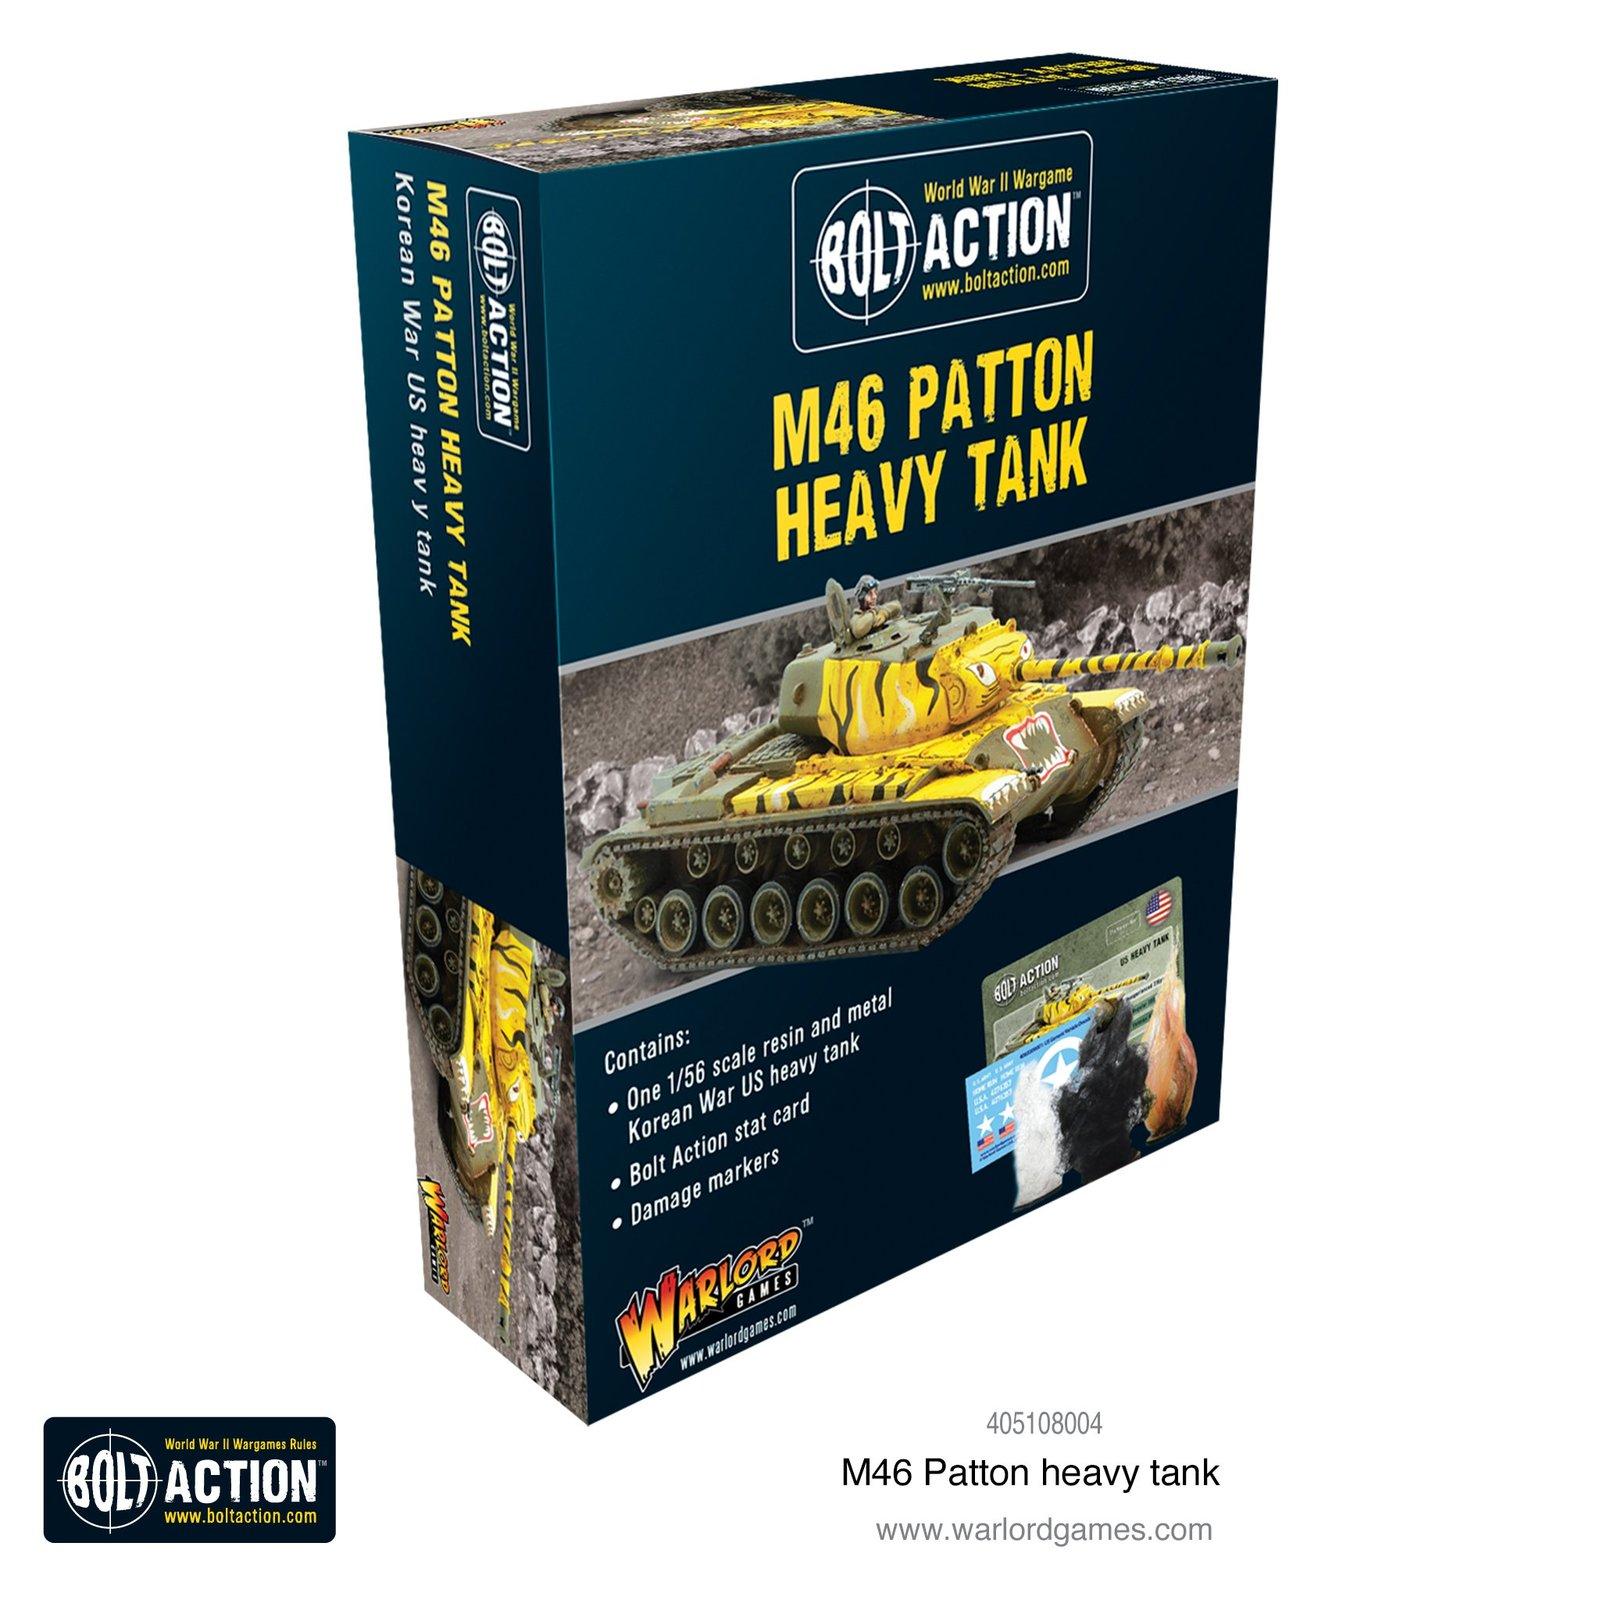 Bolt Action: M46 Patton heavy tank image